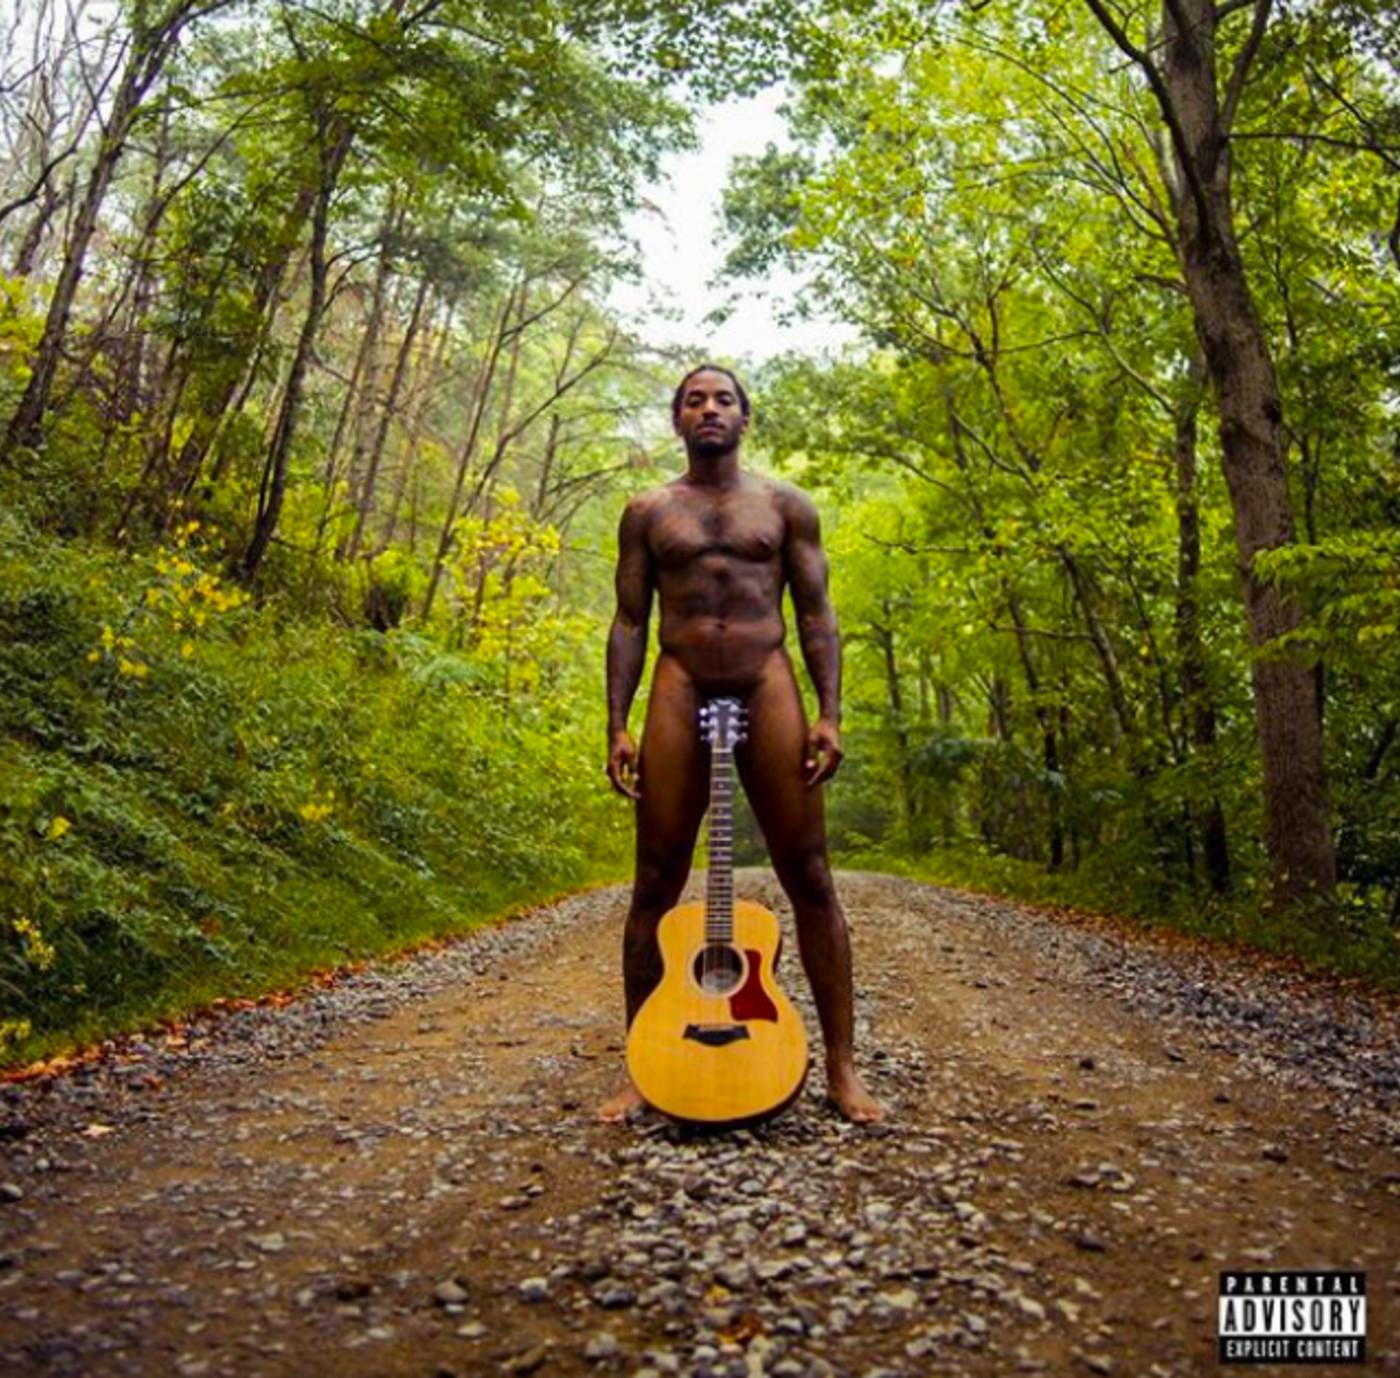 Tru lloyd album cover